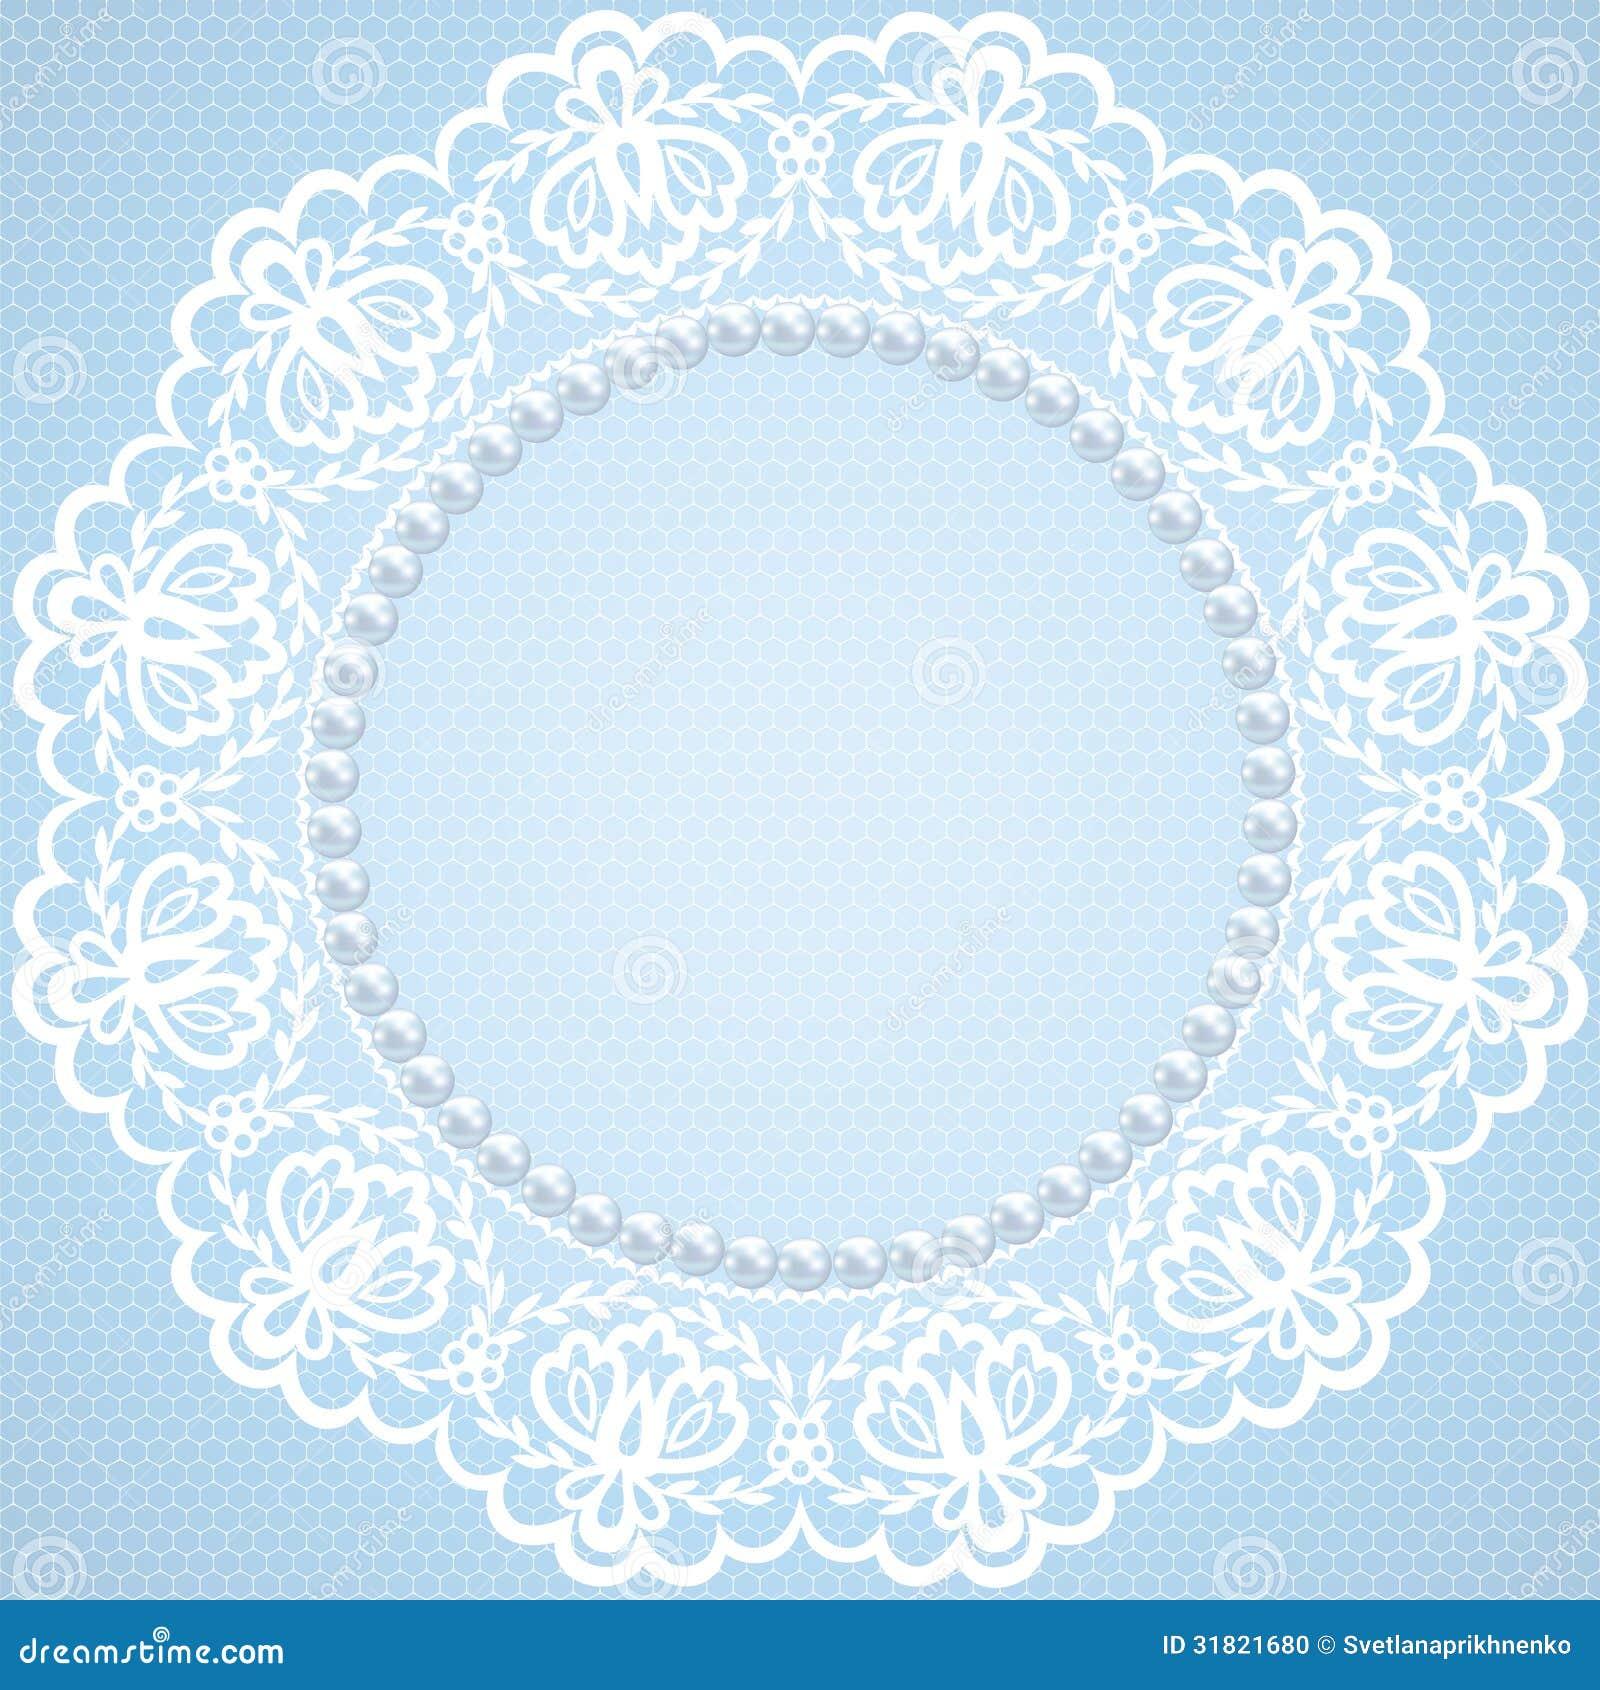 Islamic Wedding Invitation Templates is good invitation template